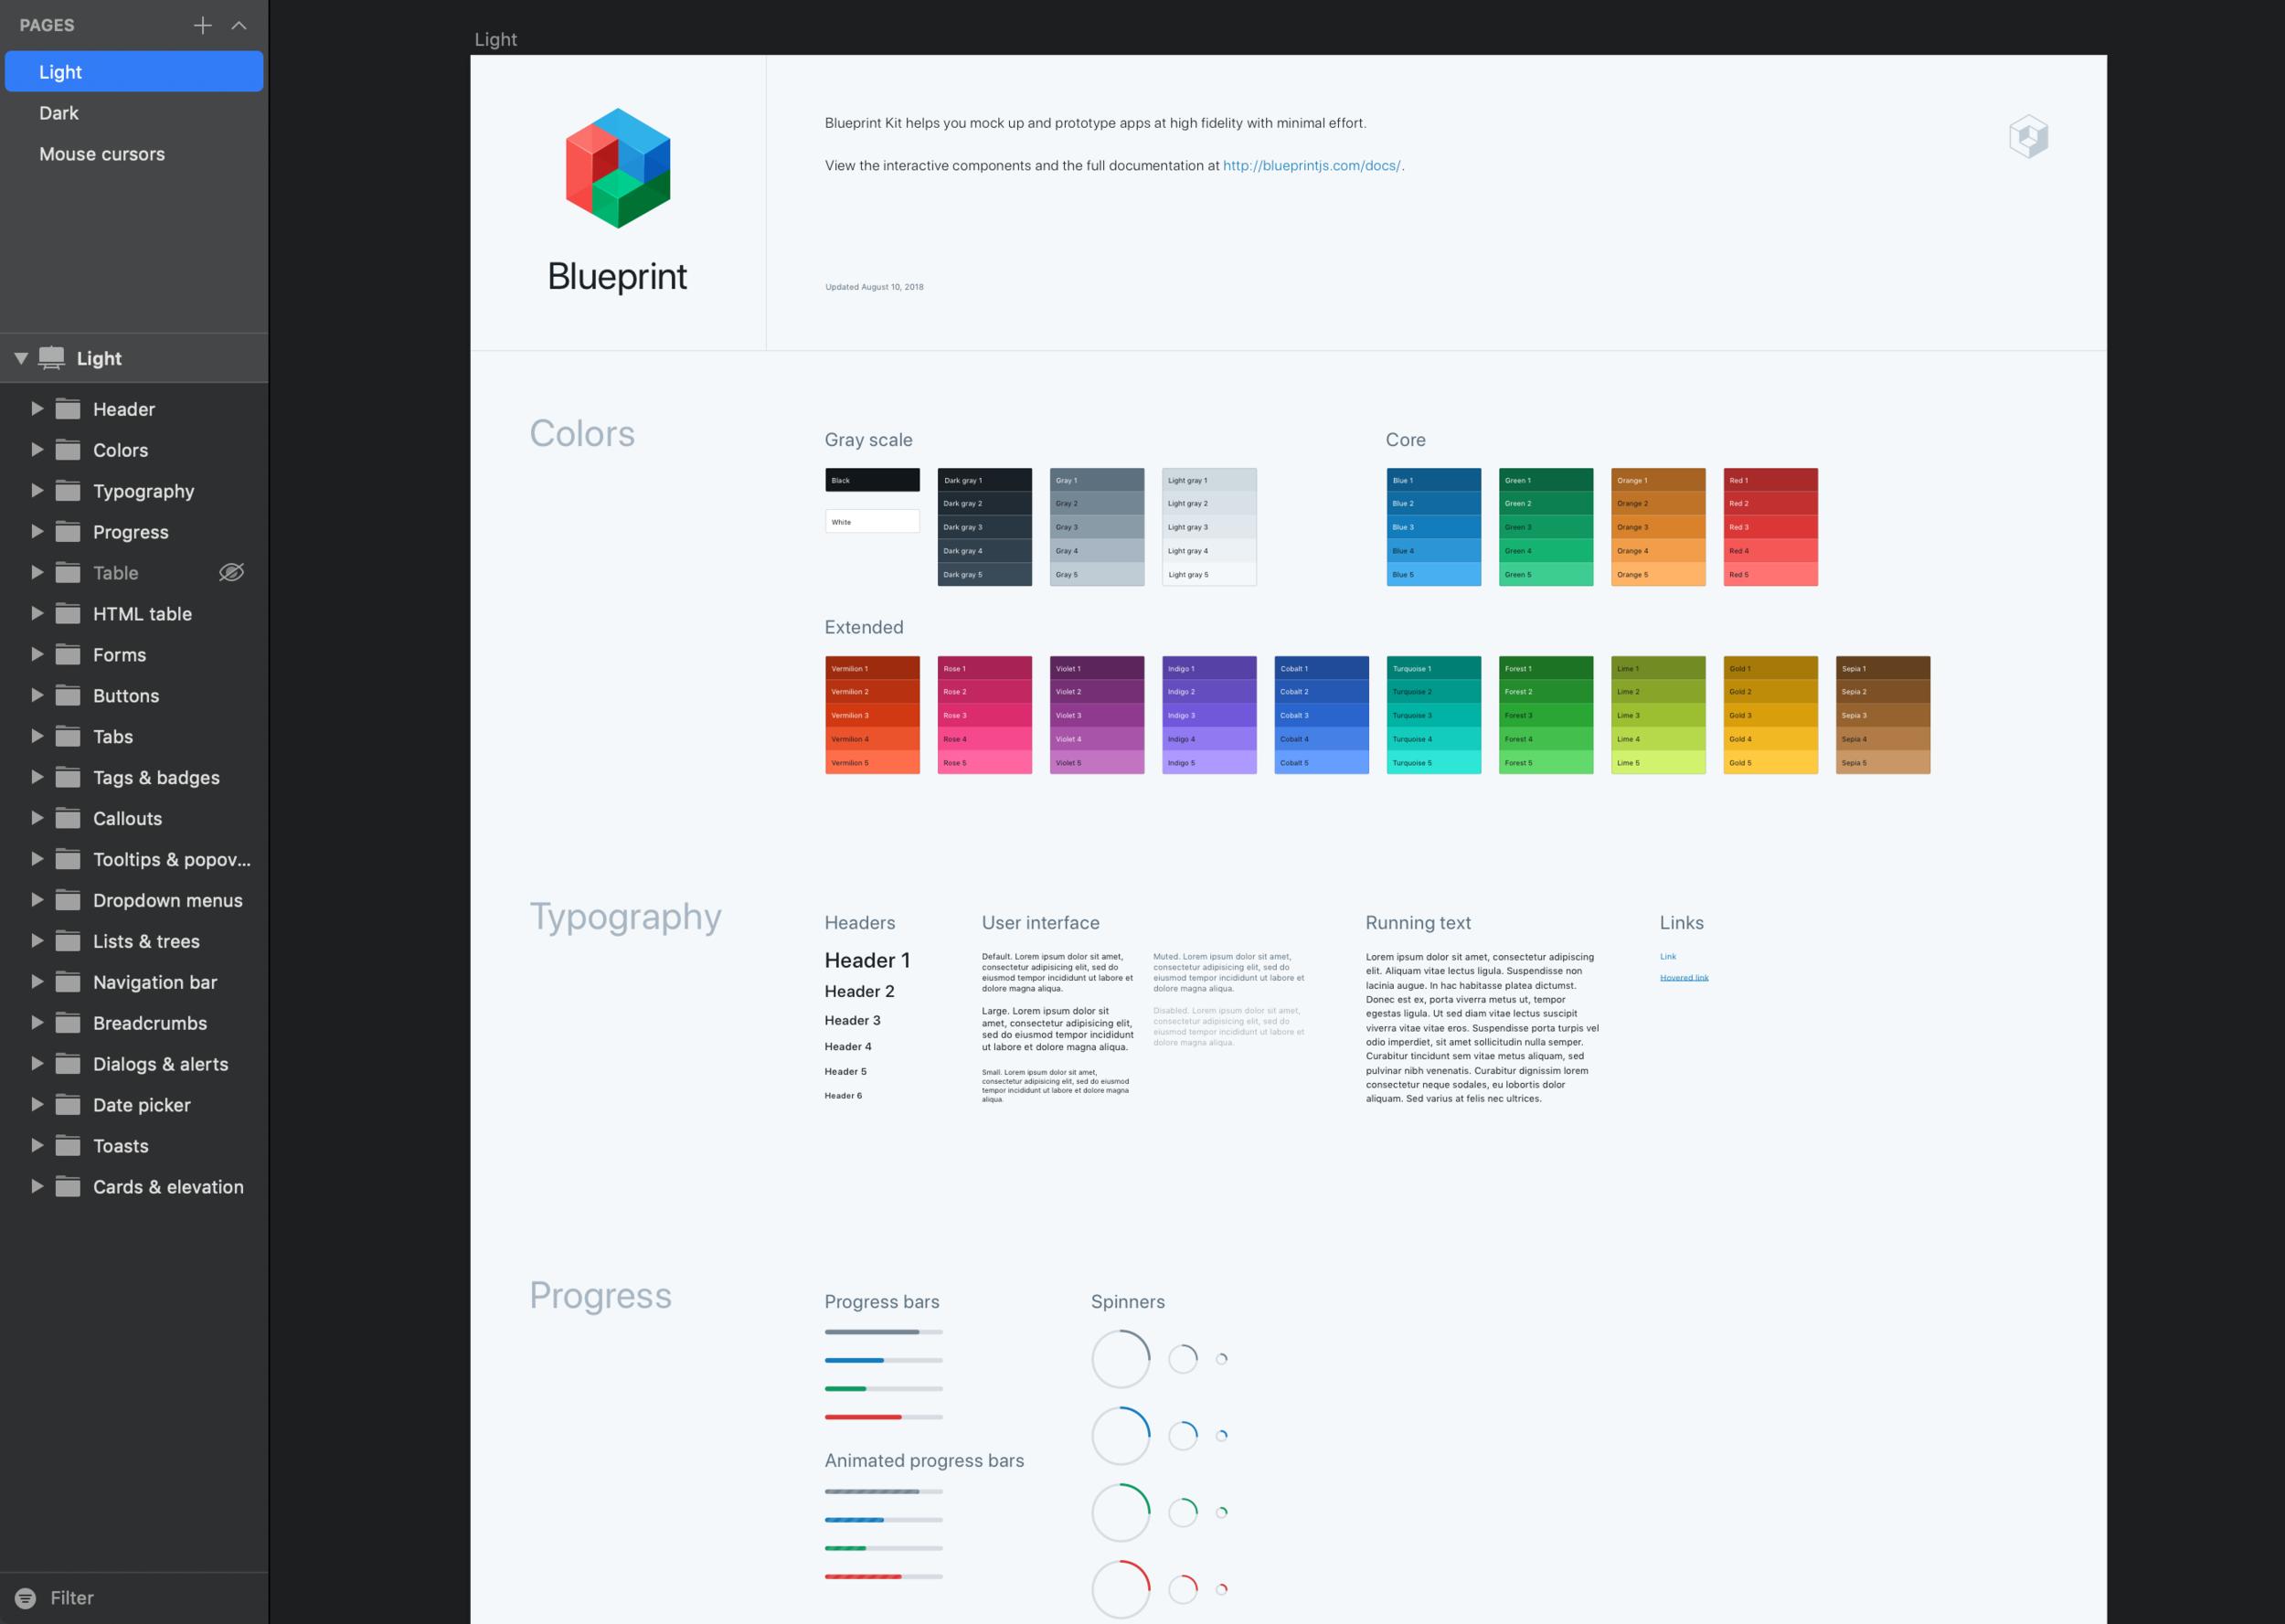 Blueprint.js' current Sketch UI kit, last updated August 2018.